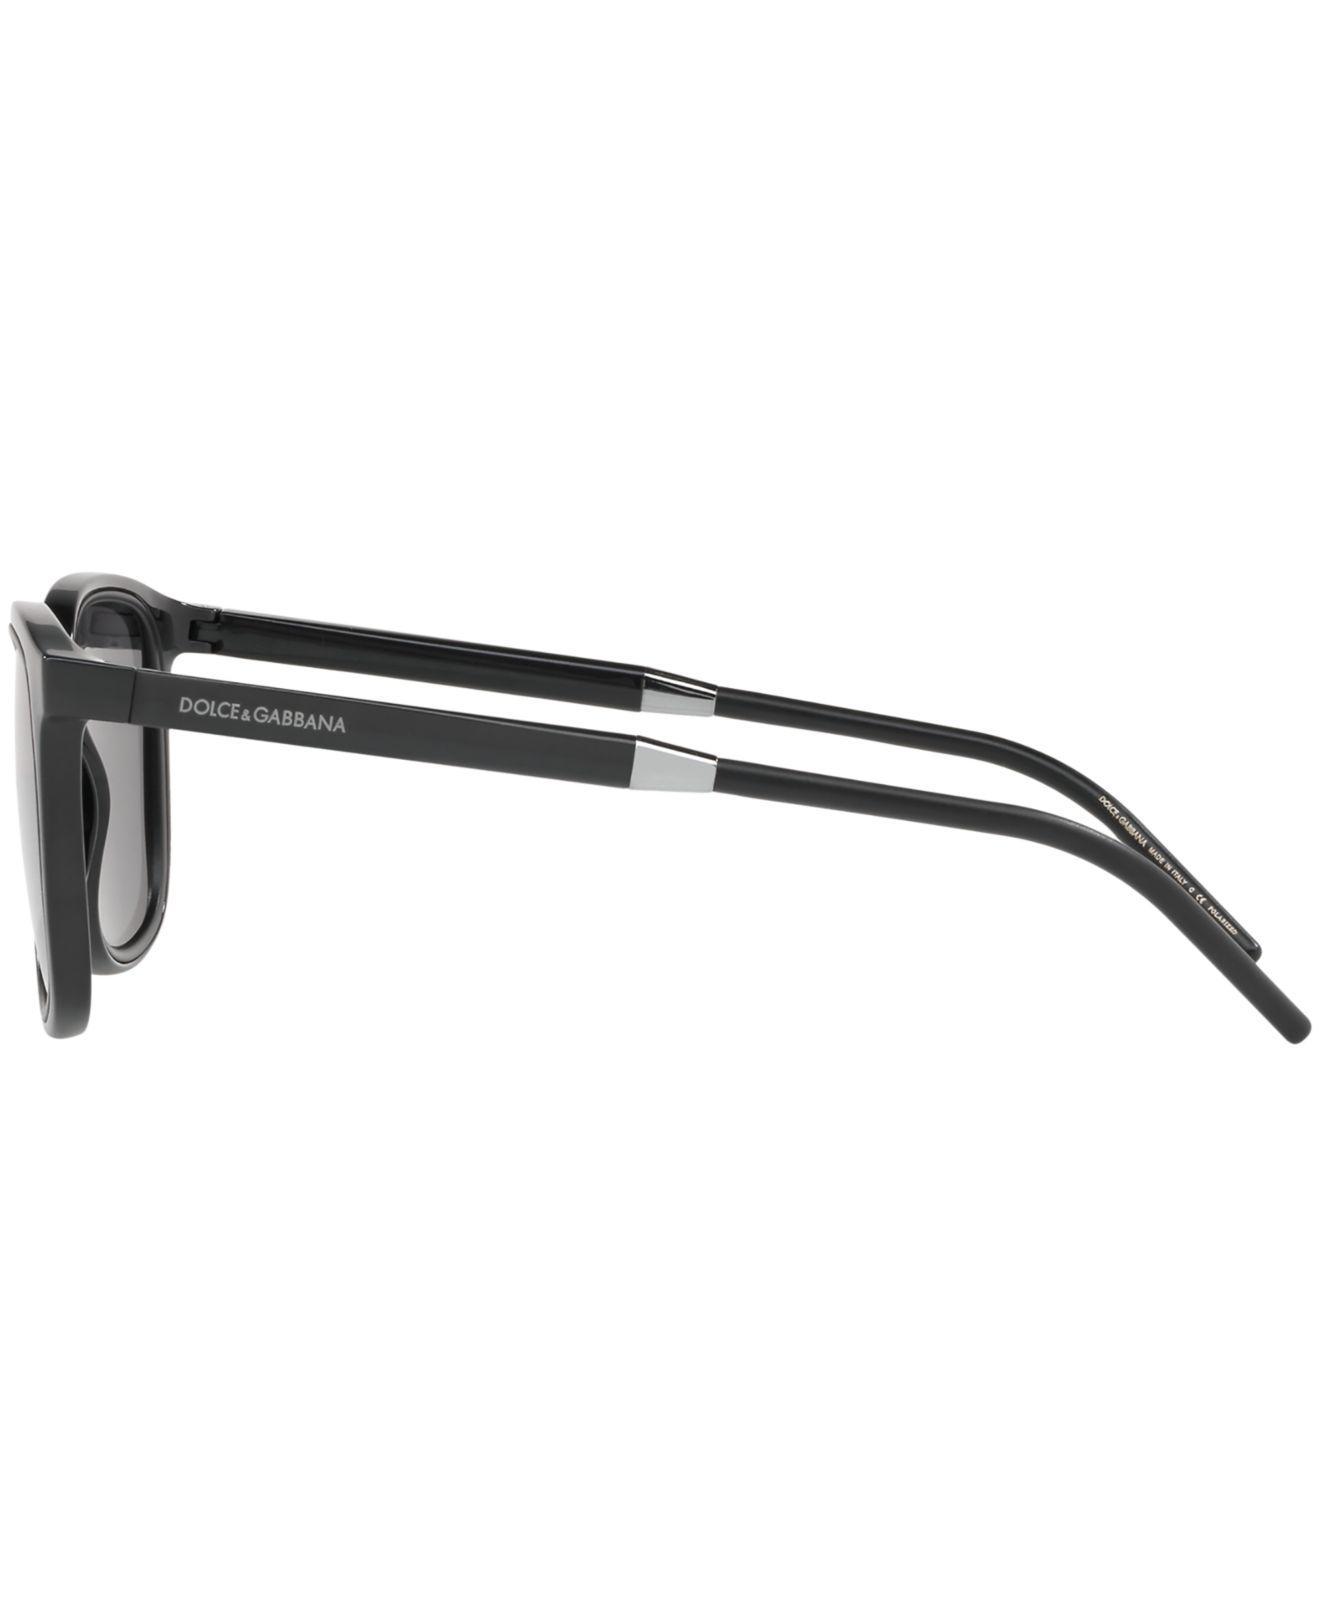 67bc9eb418b Dolce   Gabbana - Black Sunglasses